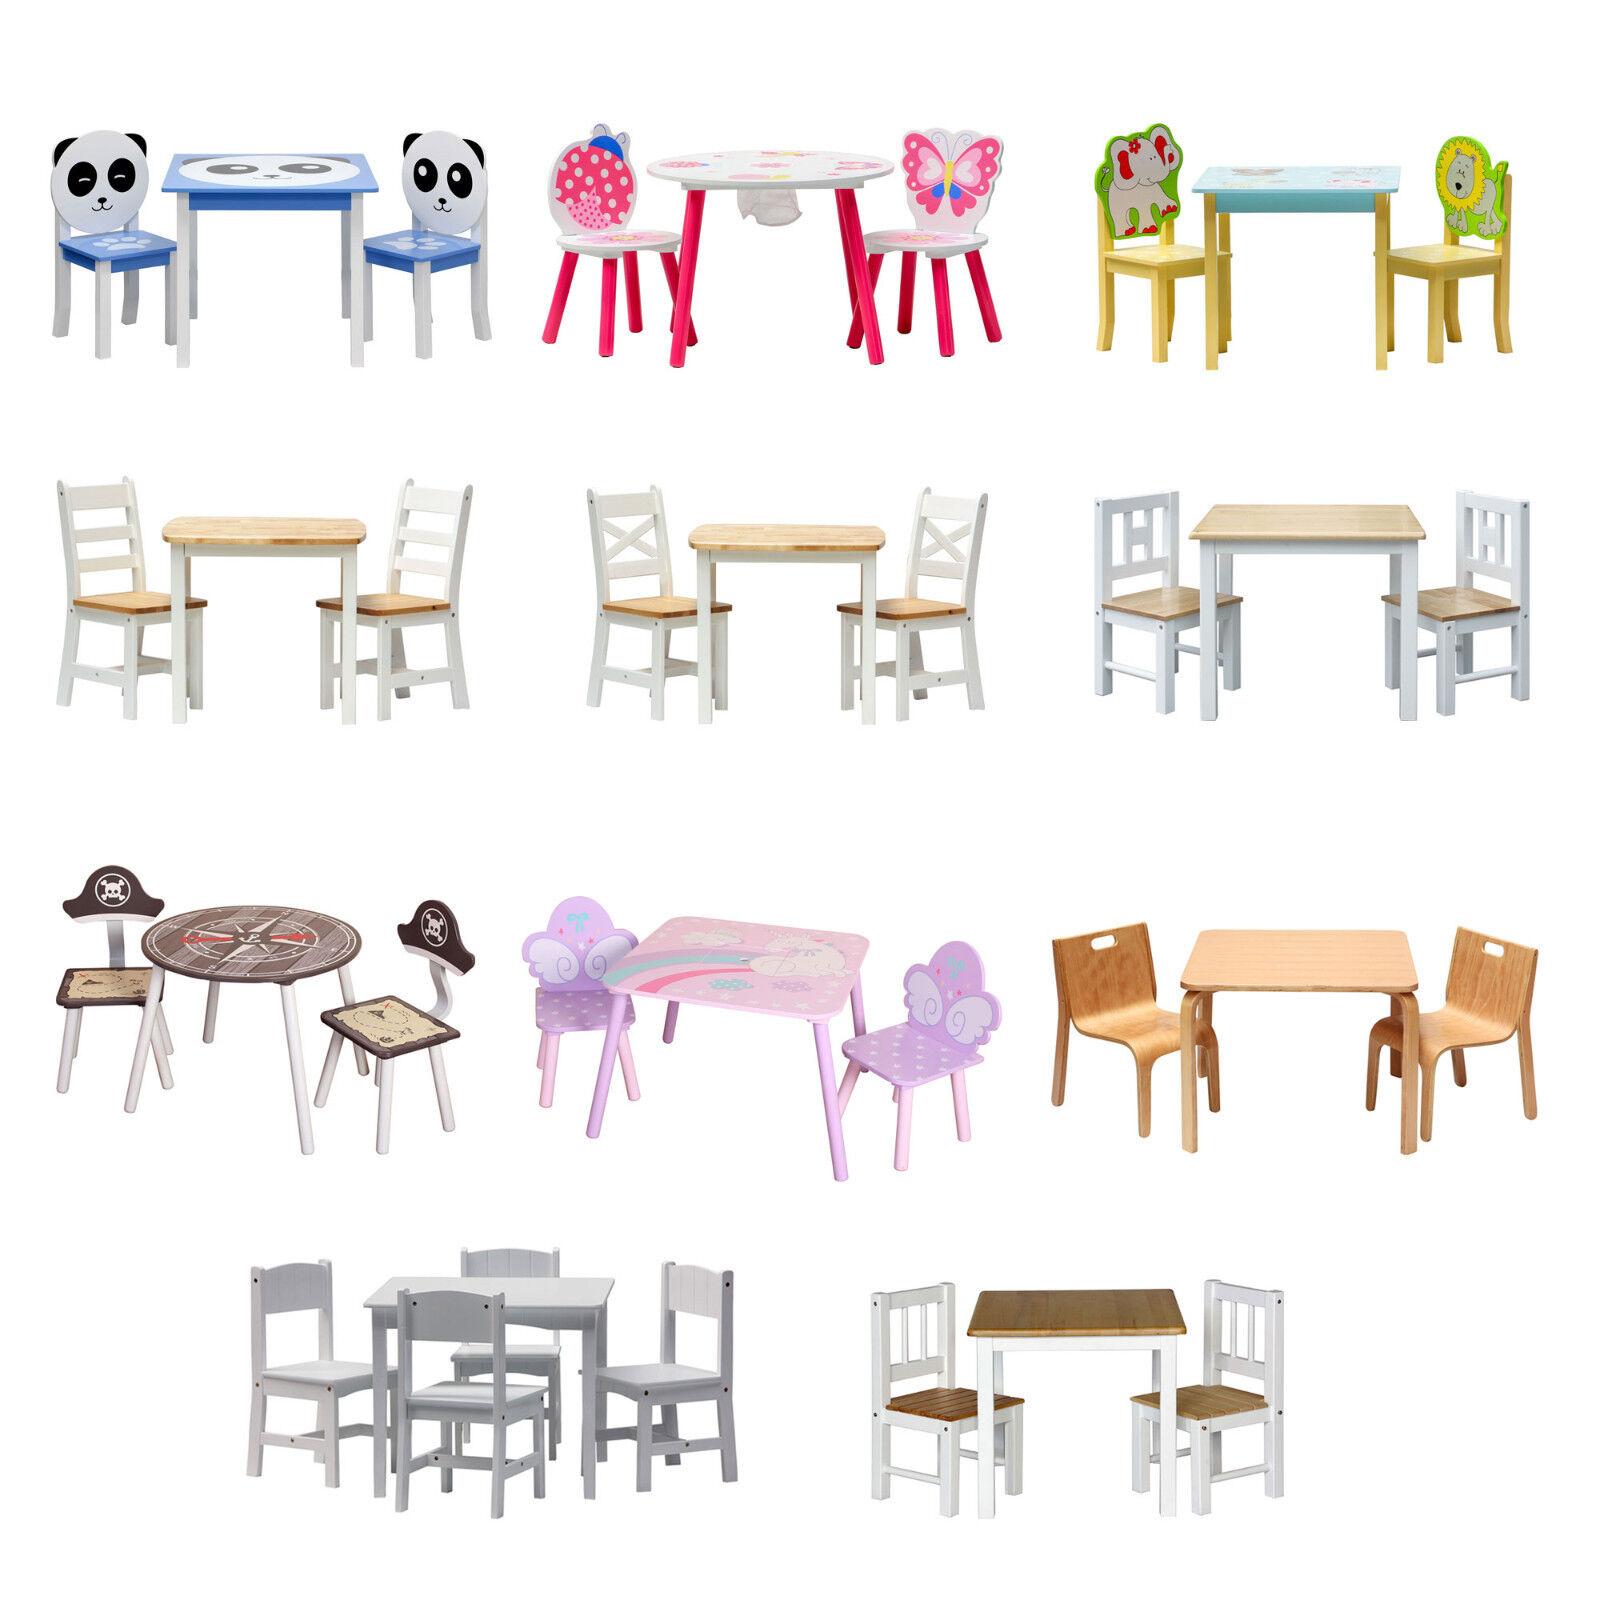 ib style® - Kindersitzgruppe Tischset Kindermöbel Kindertisch Kinderstuhl Holz